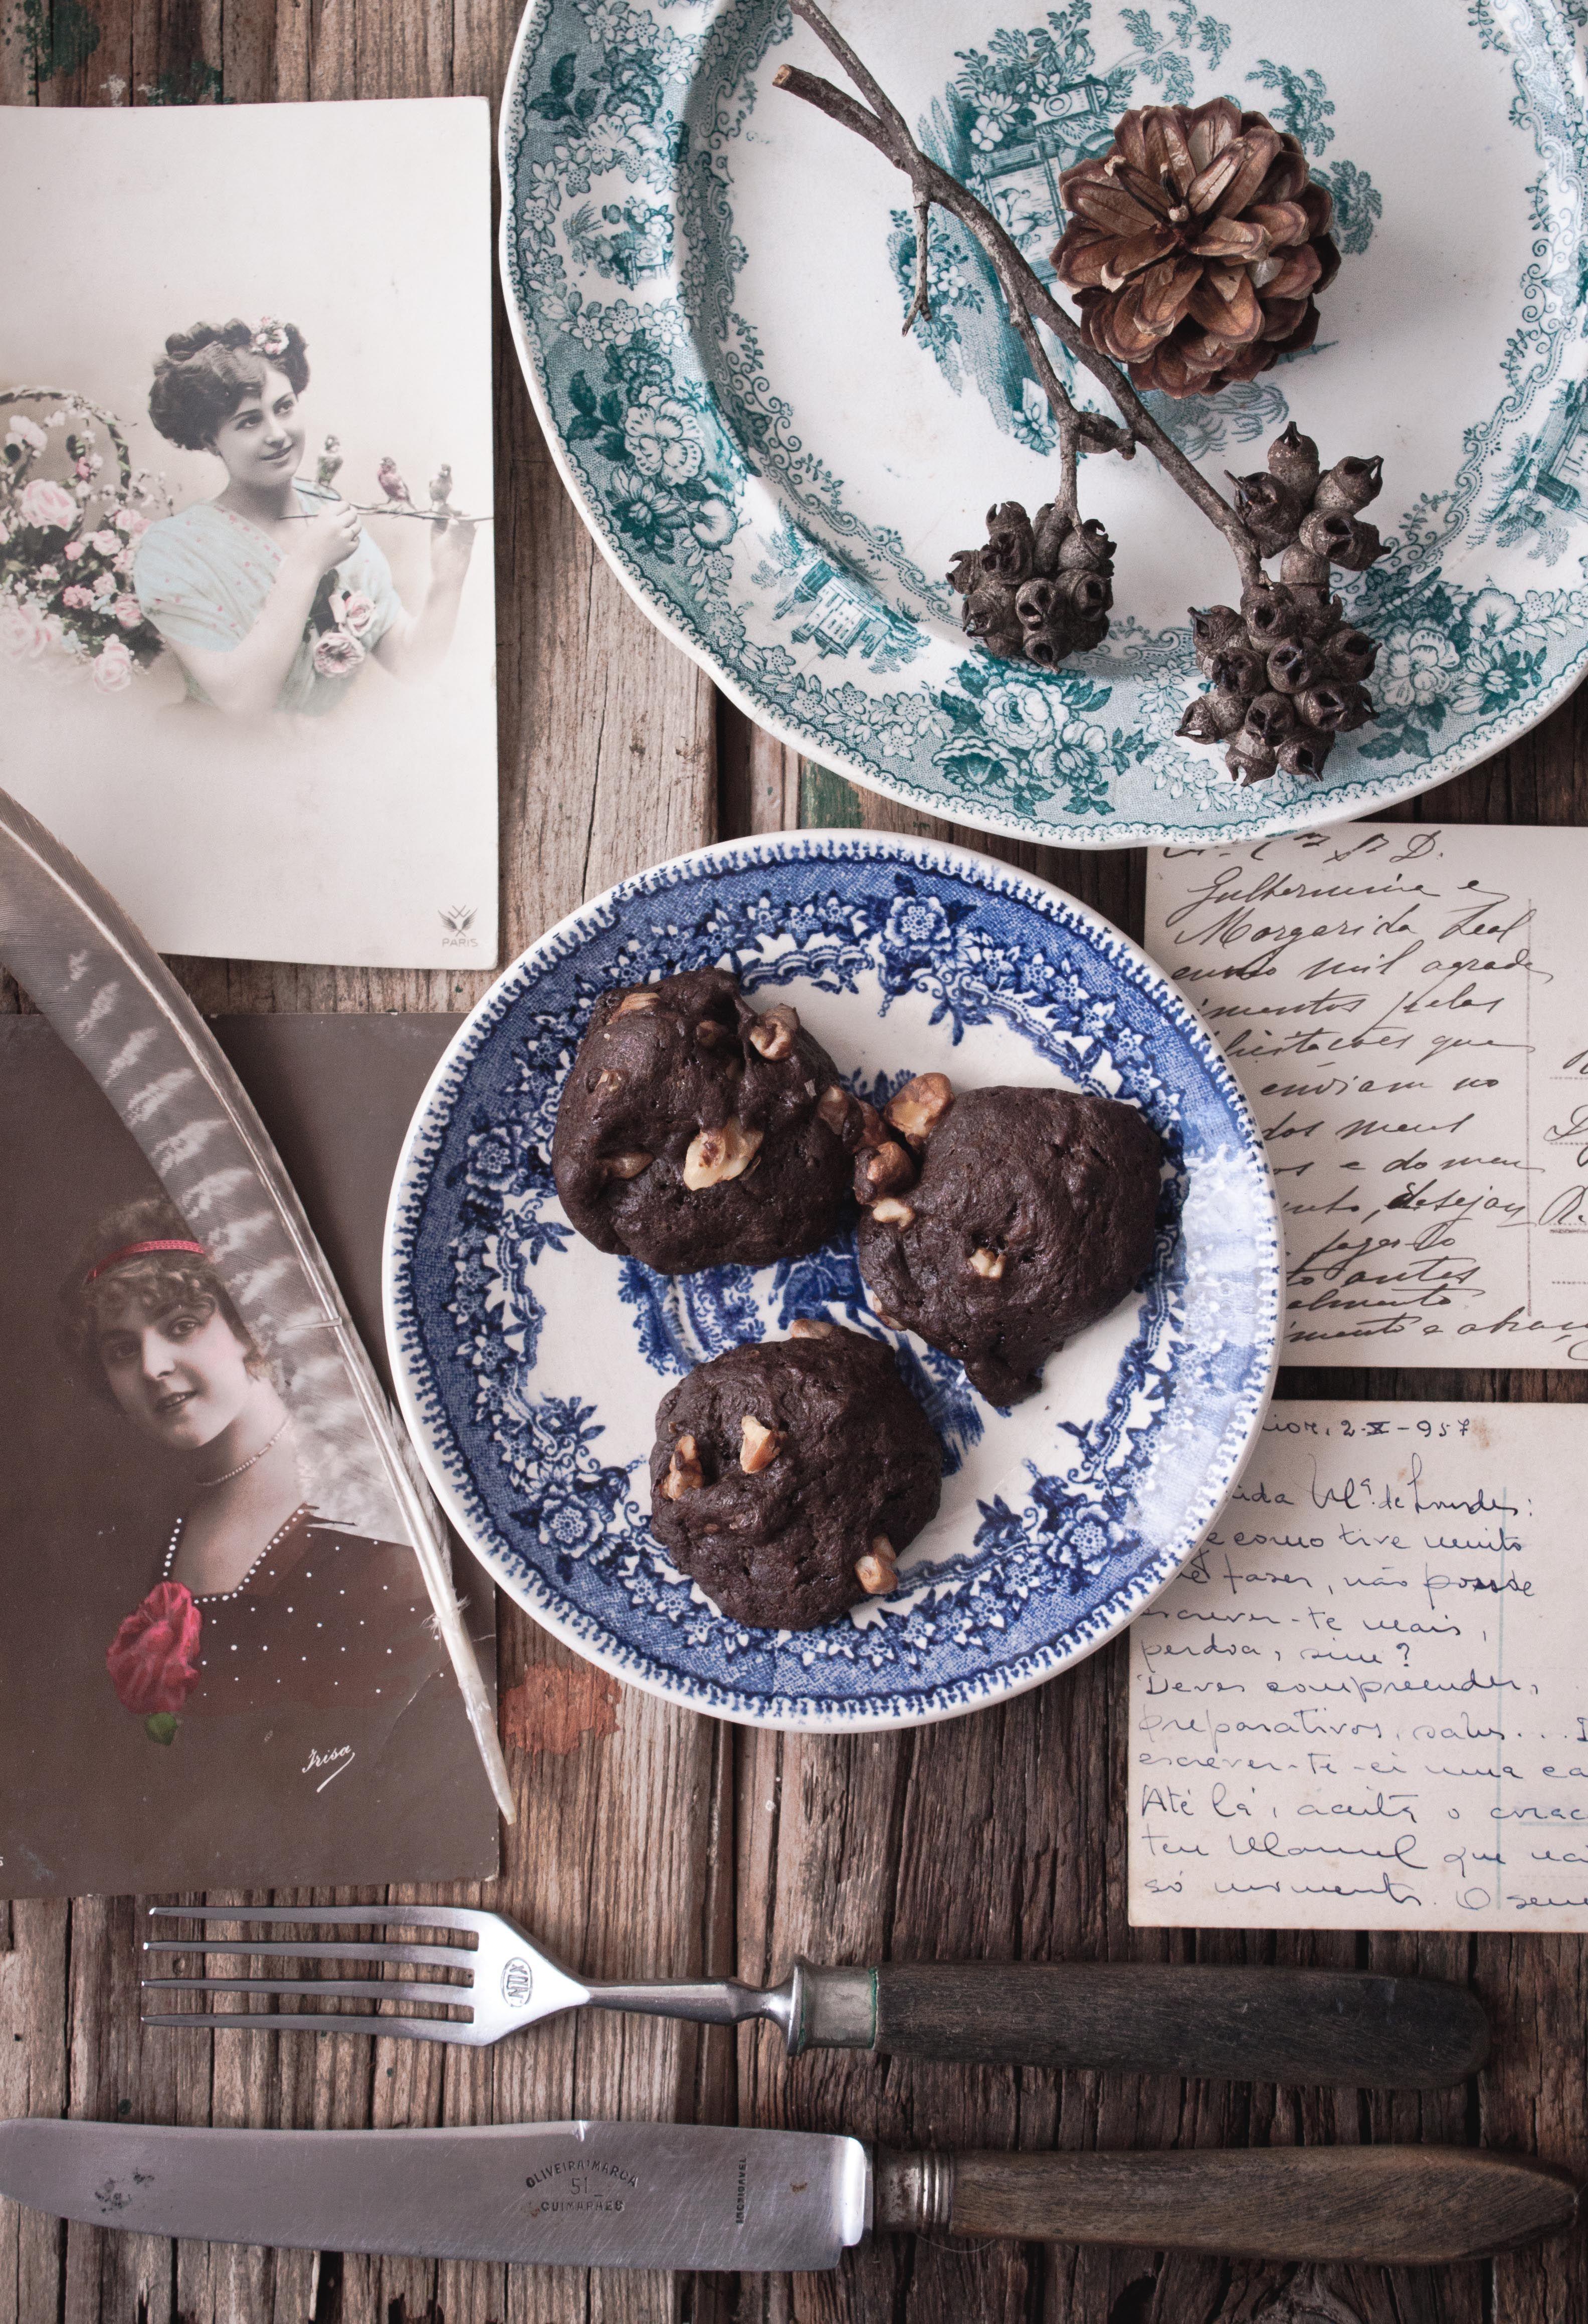 Carob Cookies | Photography and Styling by Sanda Vuckovic Pagaimo